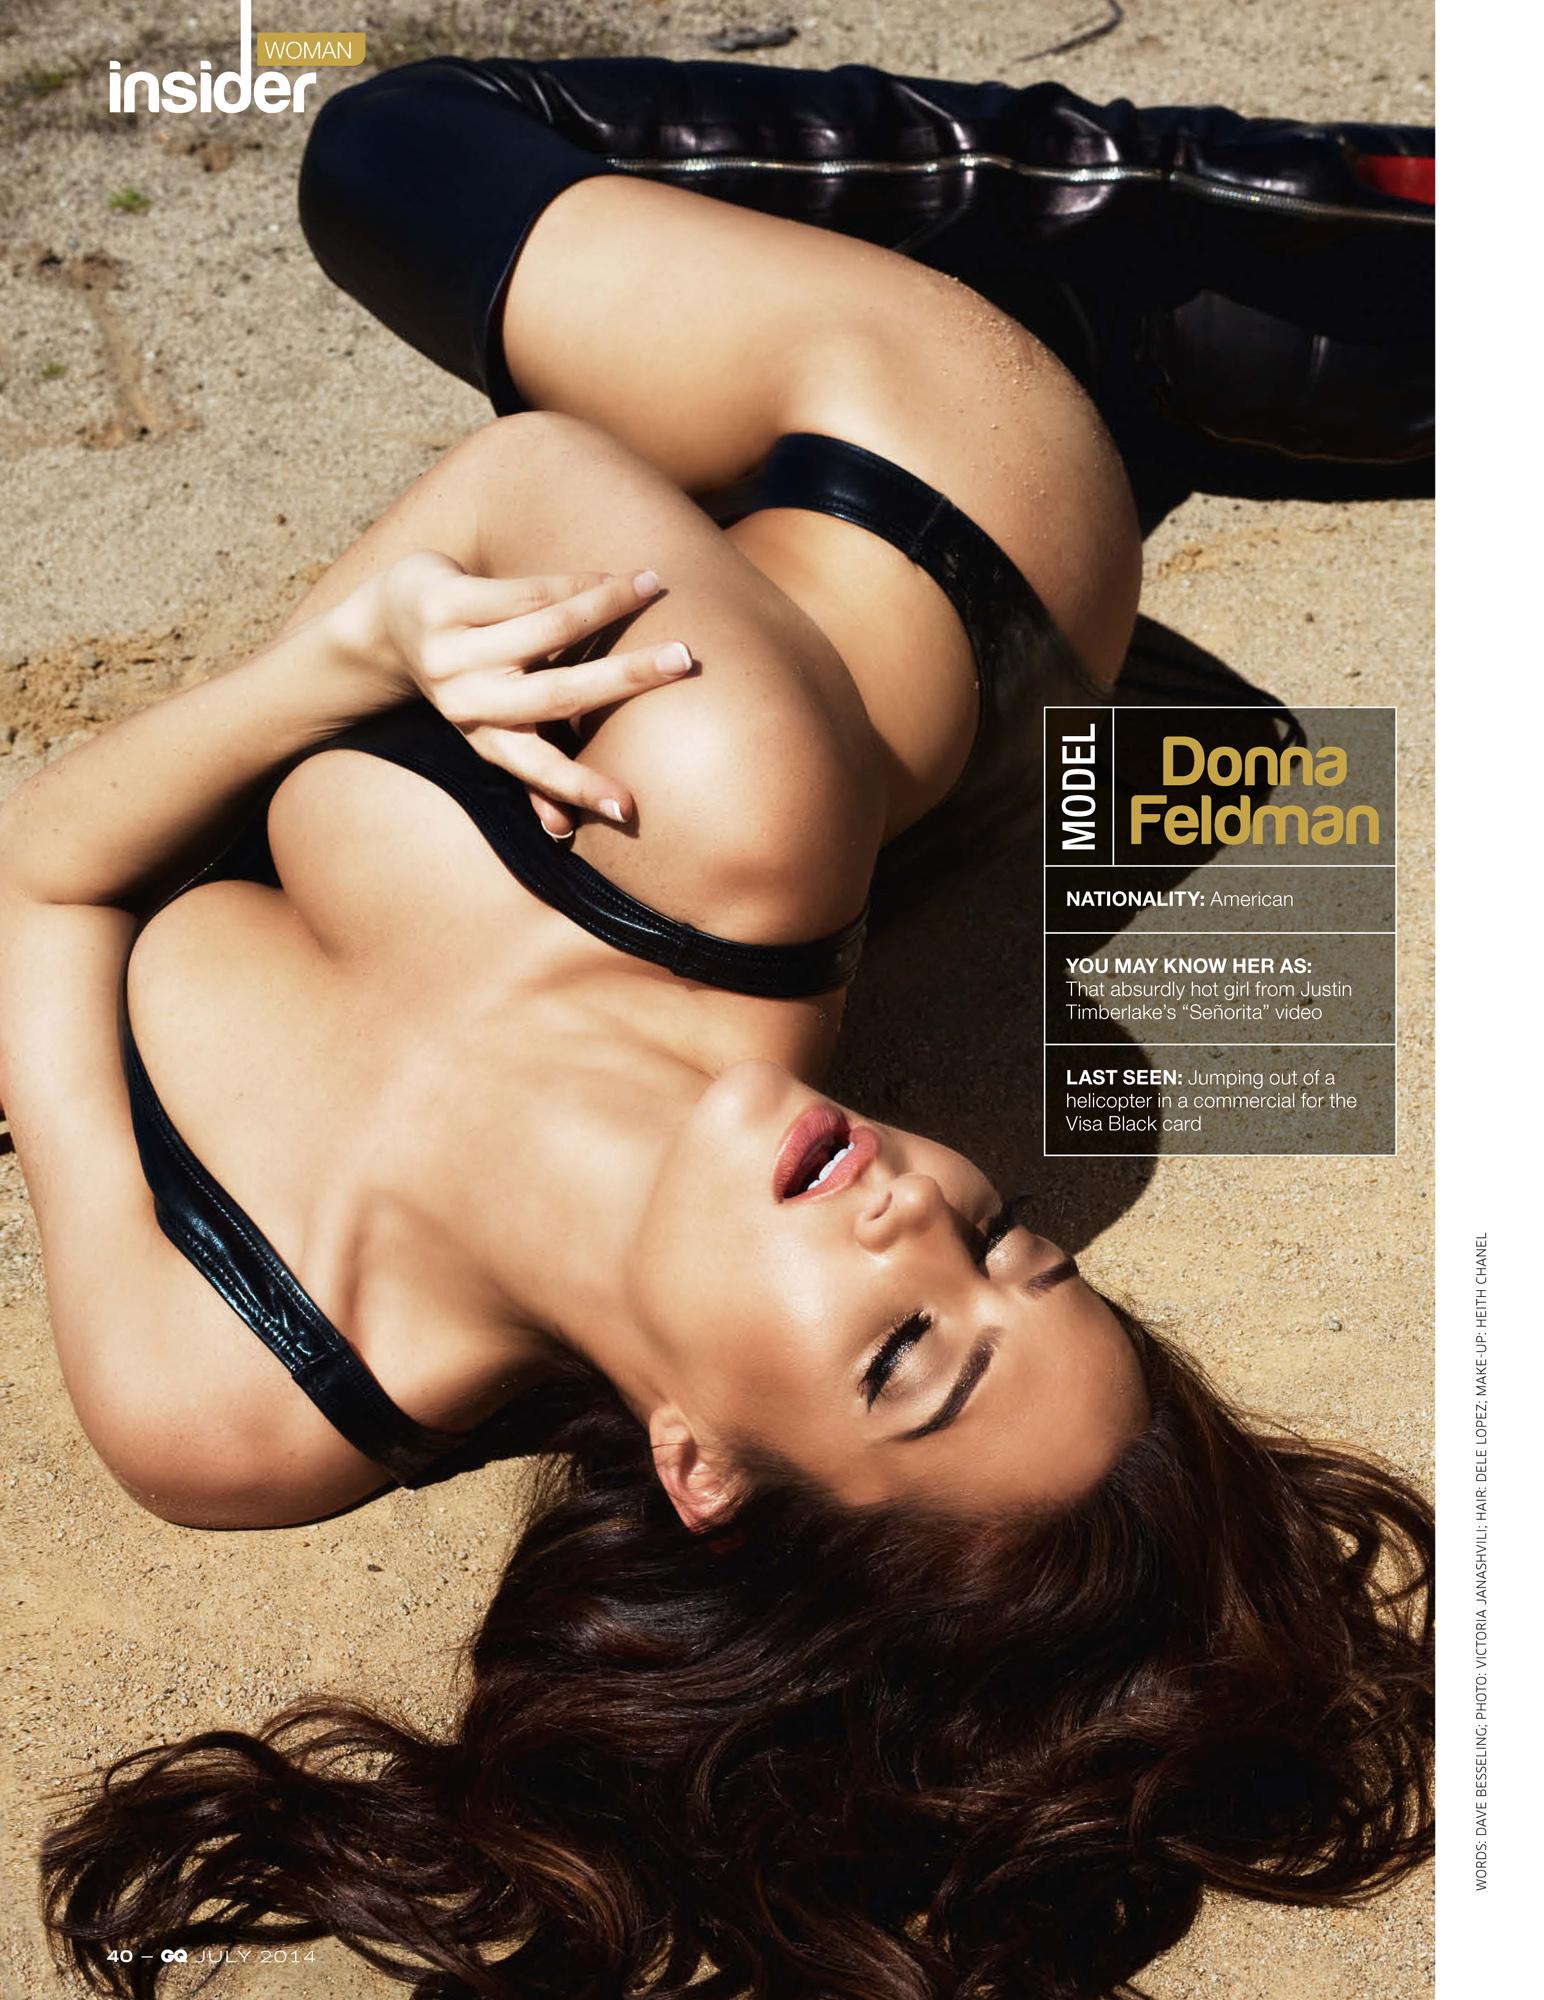 GQ India Donna Feldman